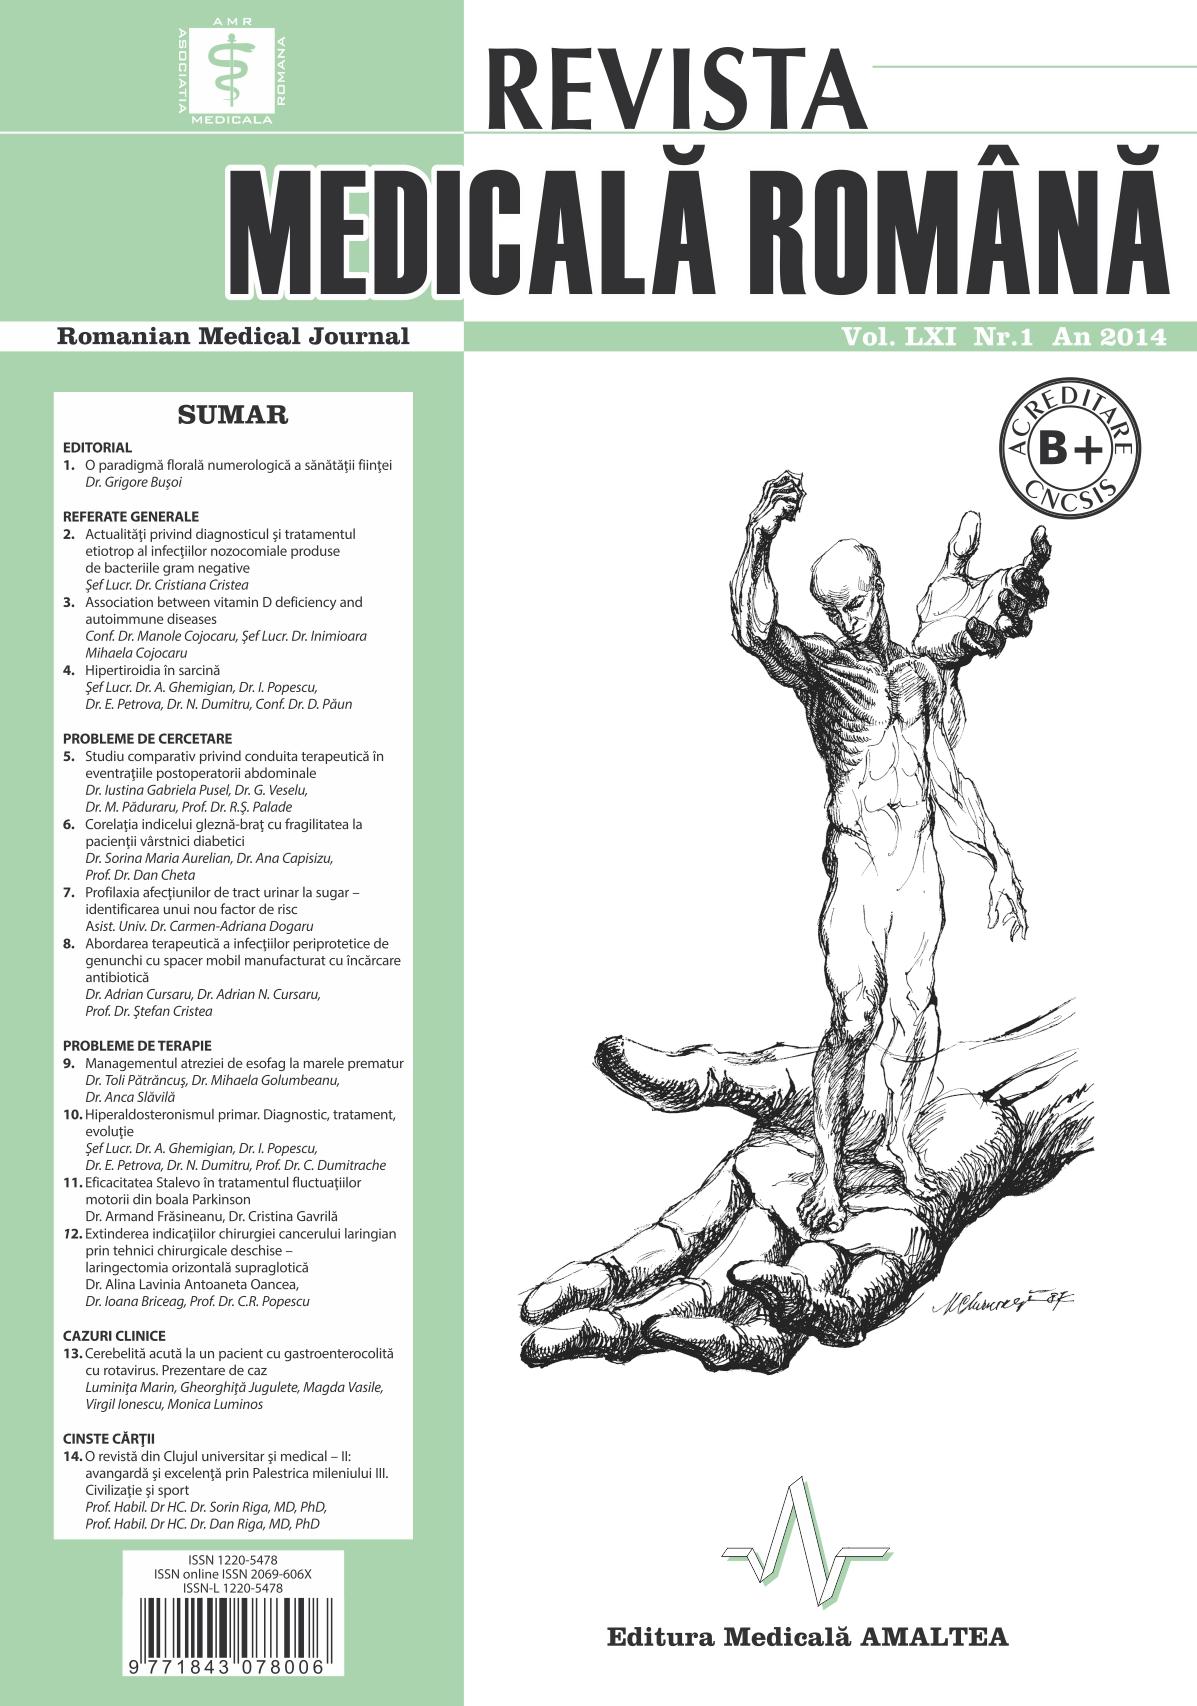 REVISTA MEDICALA ROMANA - Romanian Medical Journal, Vol. LXI, Nr. 1, An 2014